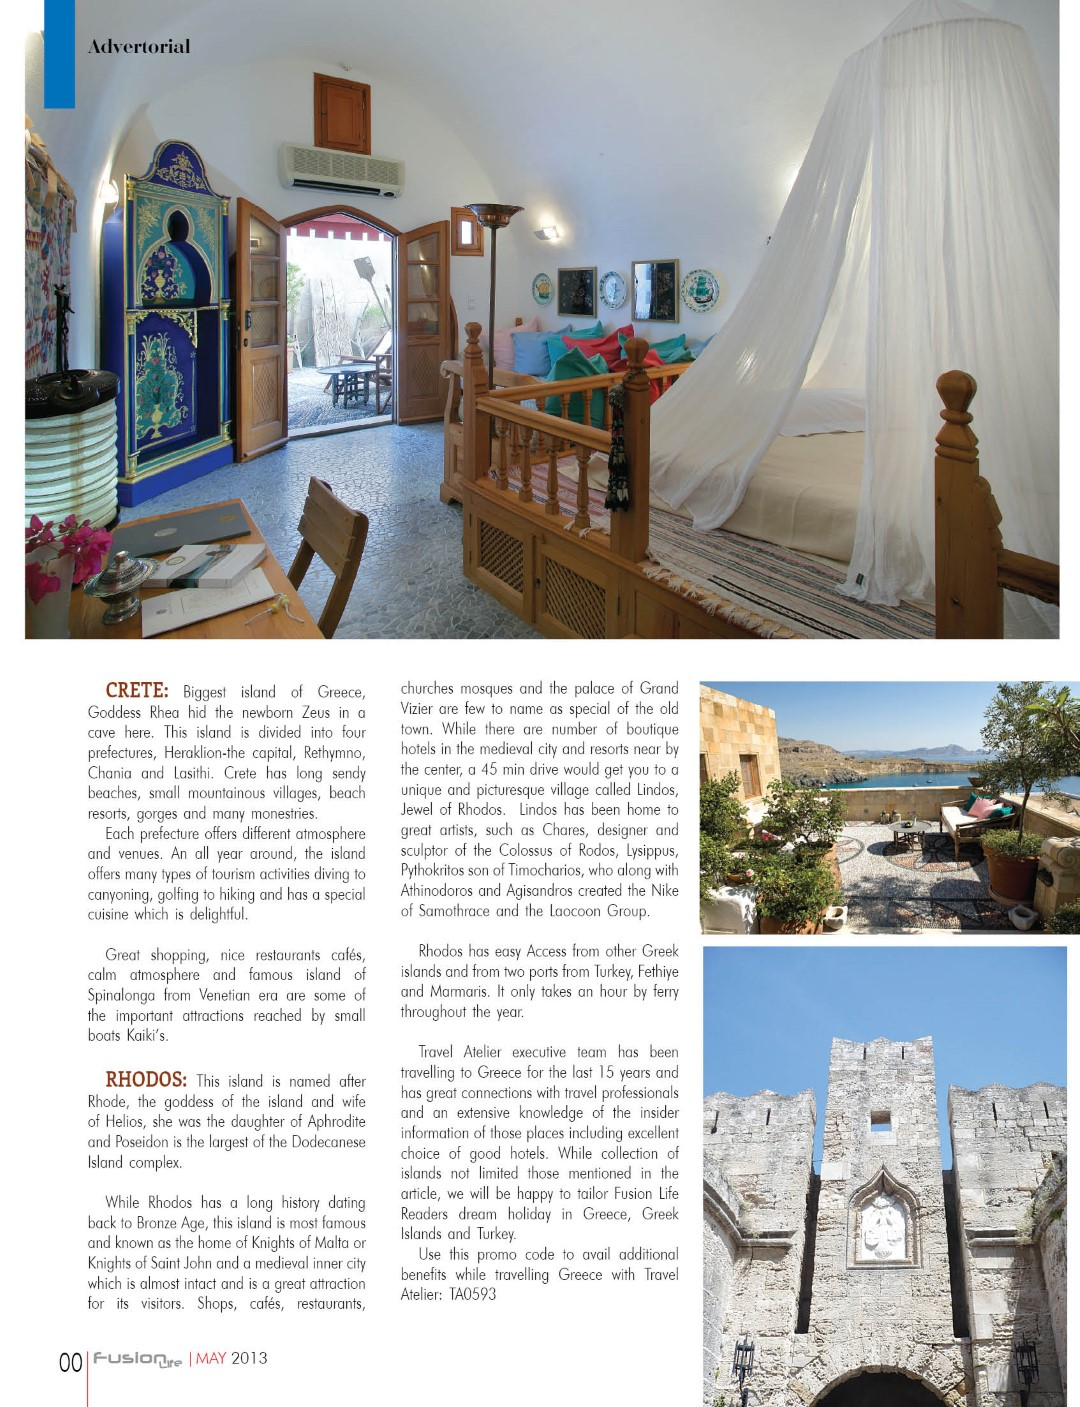 fusion-life-magazine-cappadocia